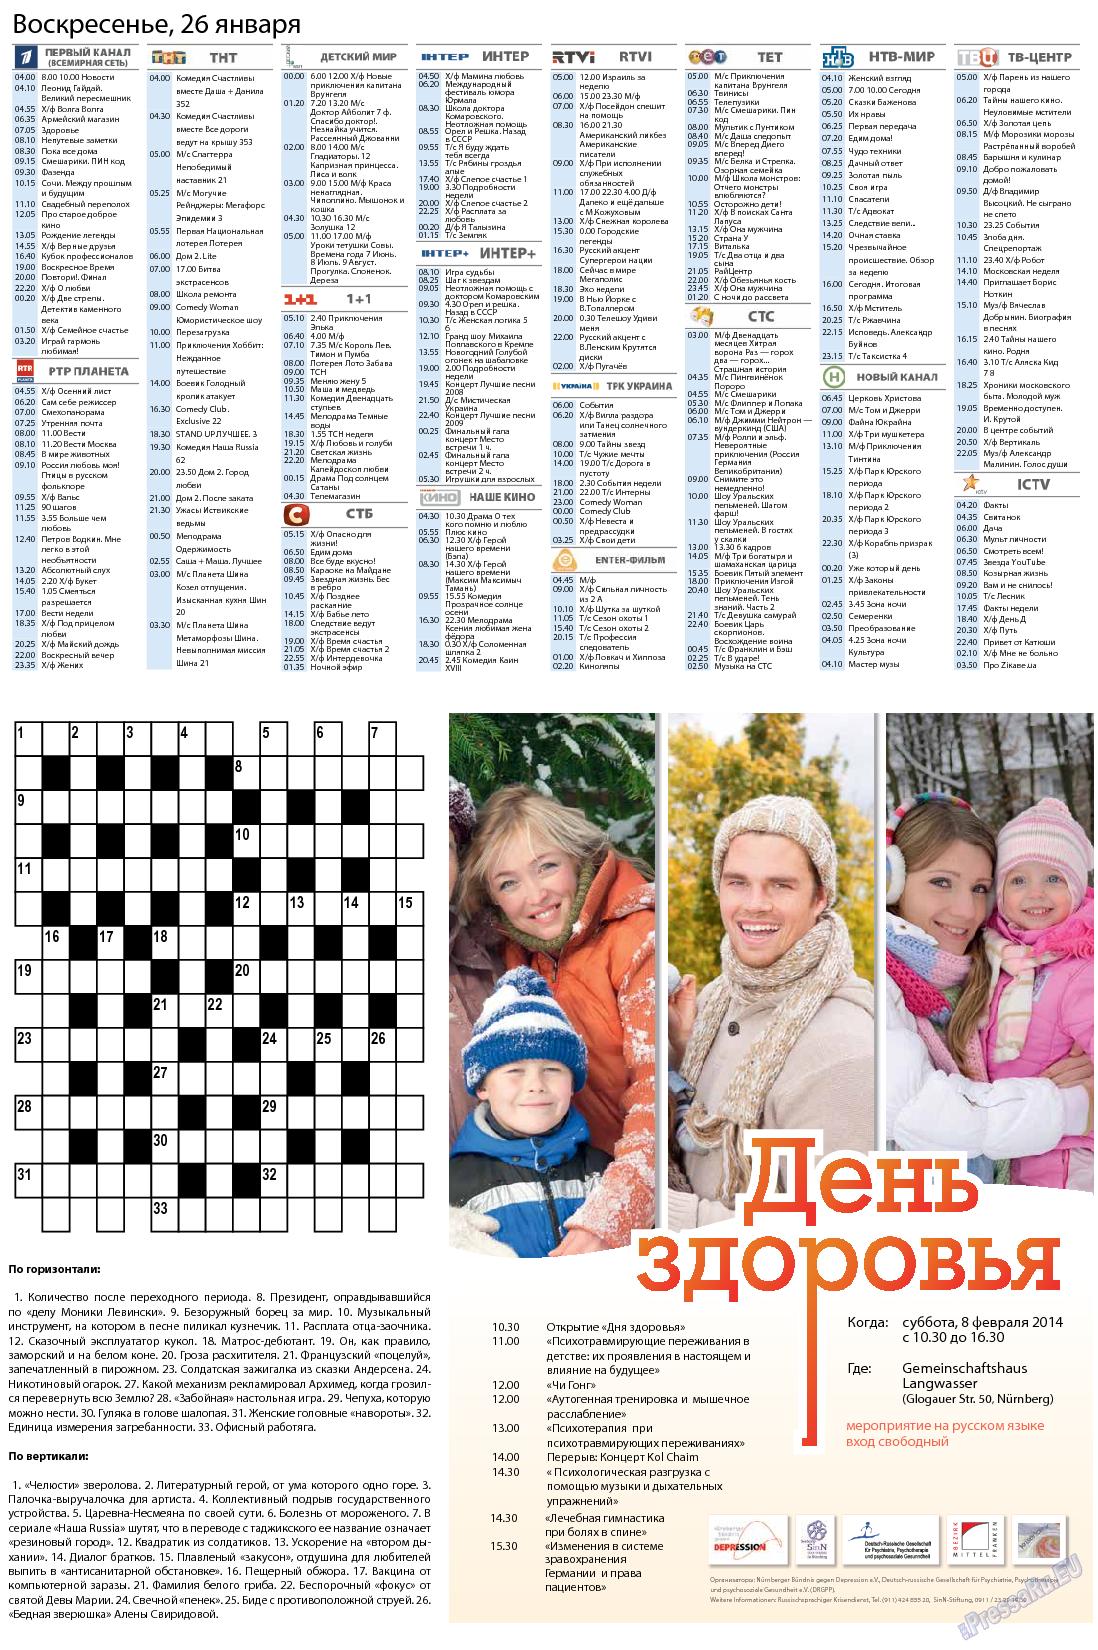 Новая Wолна (газета). 2014 год, номер 3, стр. 6